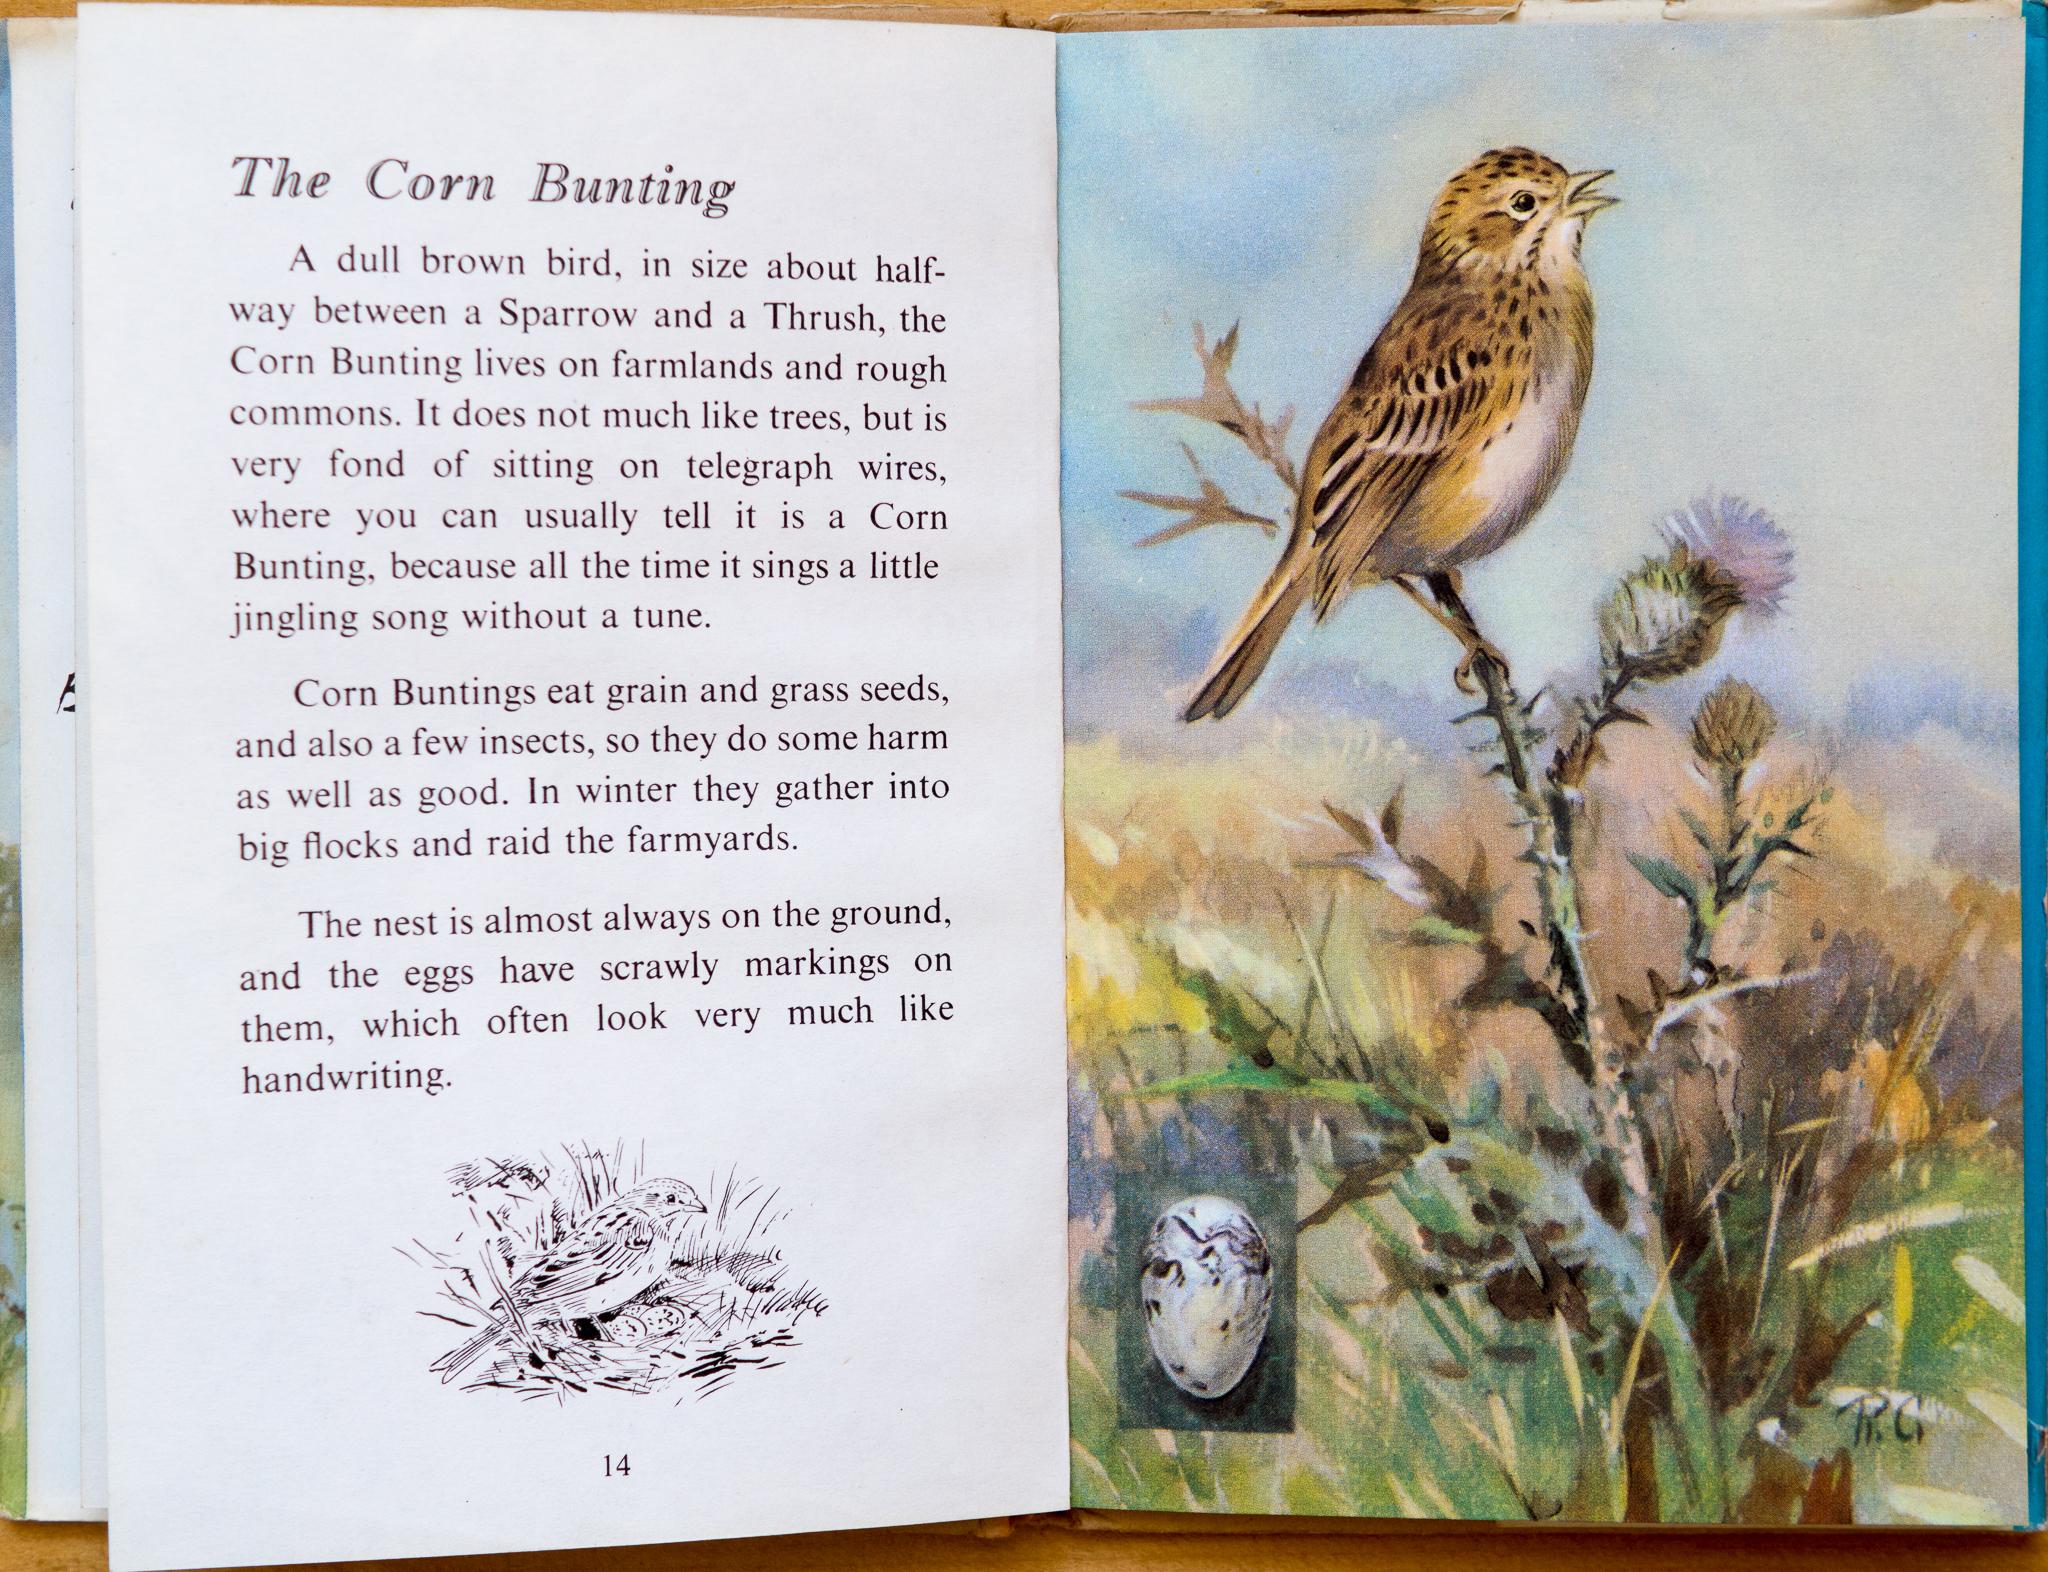 Corn Bunting - Ladybird Book of British Birds